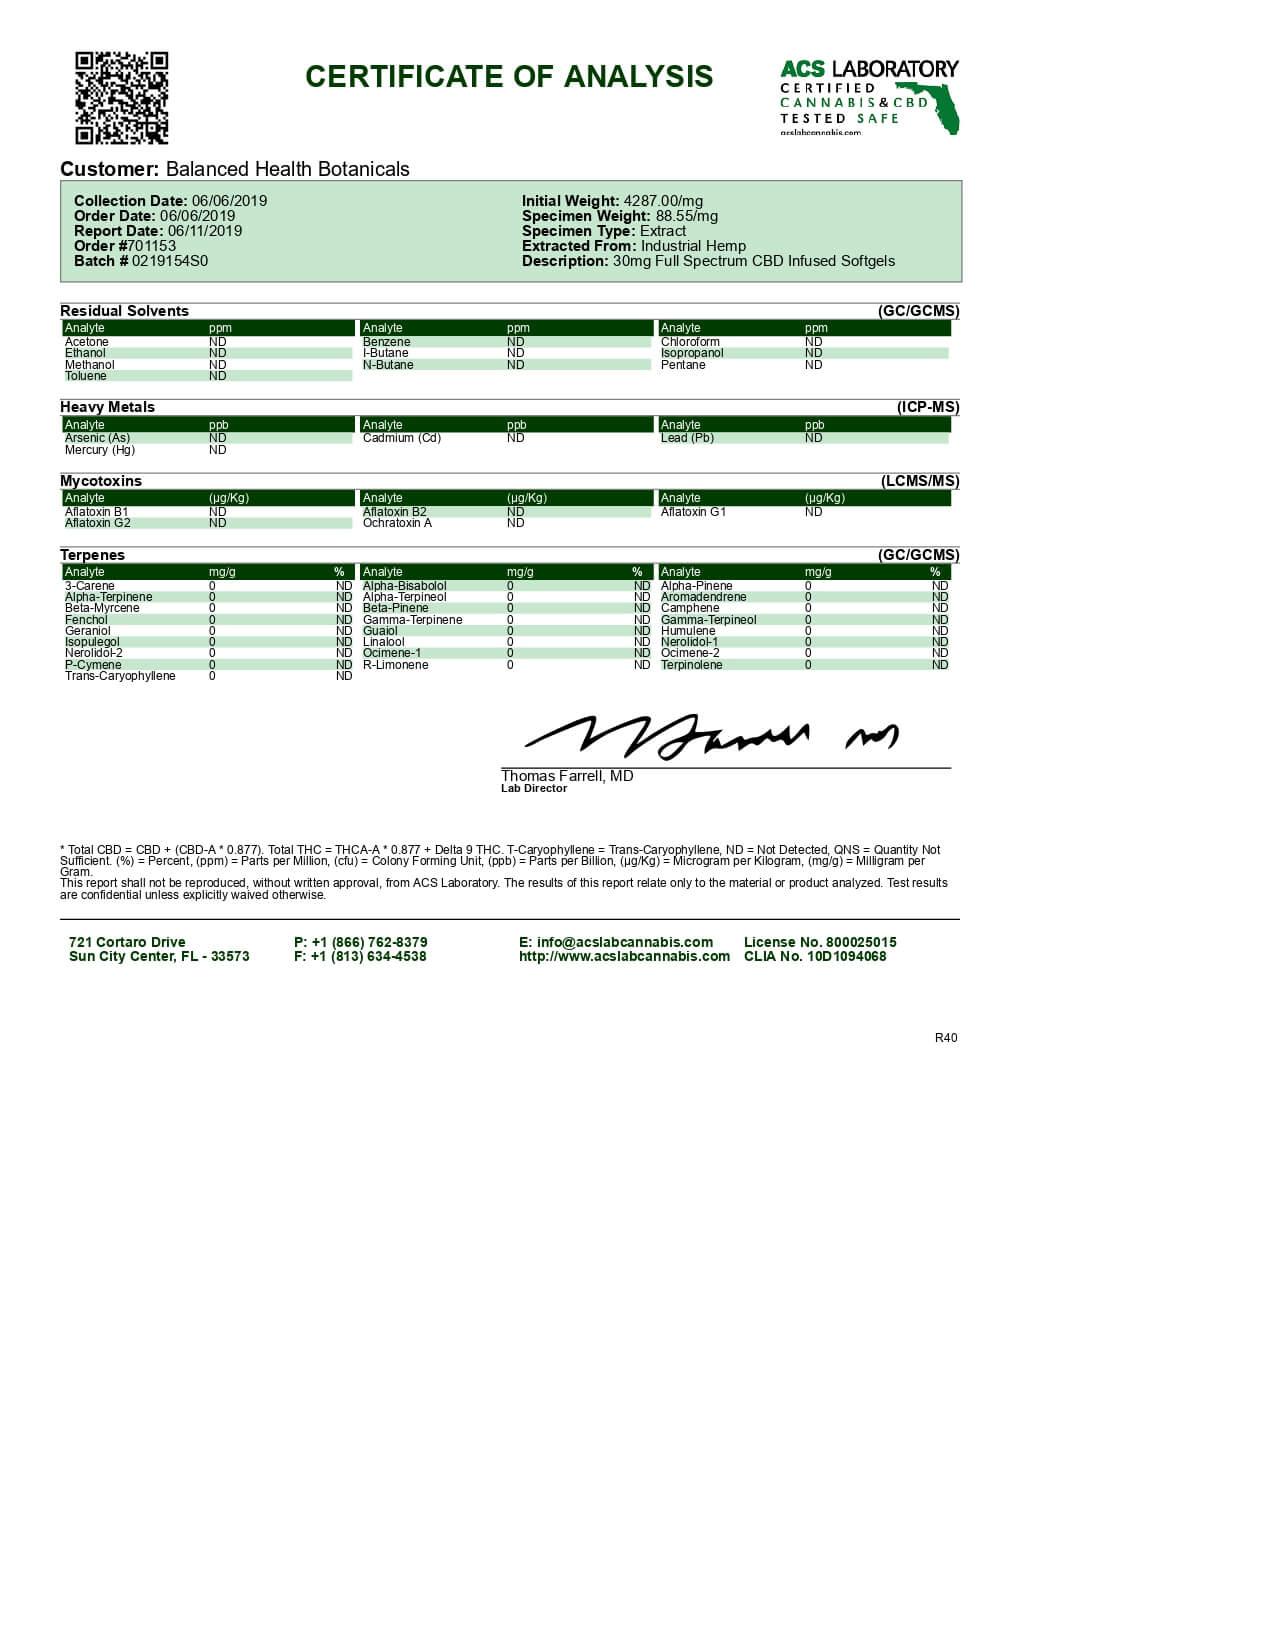 CBDistillery CBD Softgels Full Spectrum Lab Report